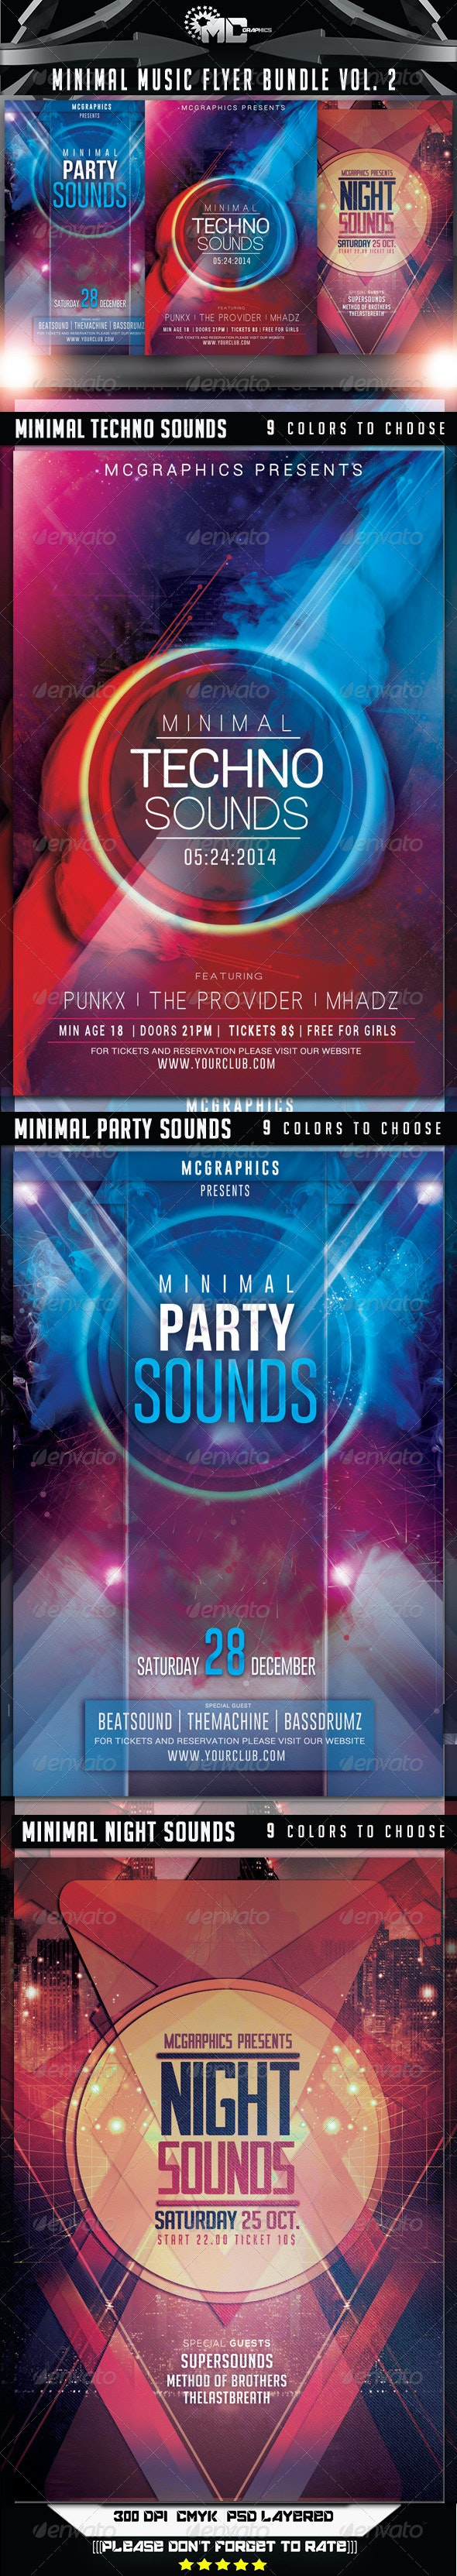 Minimal Music Flyer Bundle Vol. 2 - Clubs & Parties Events